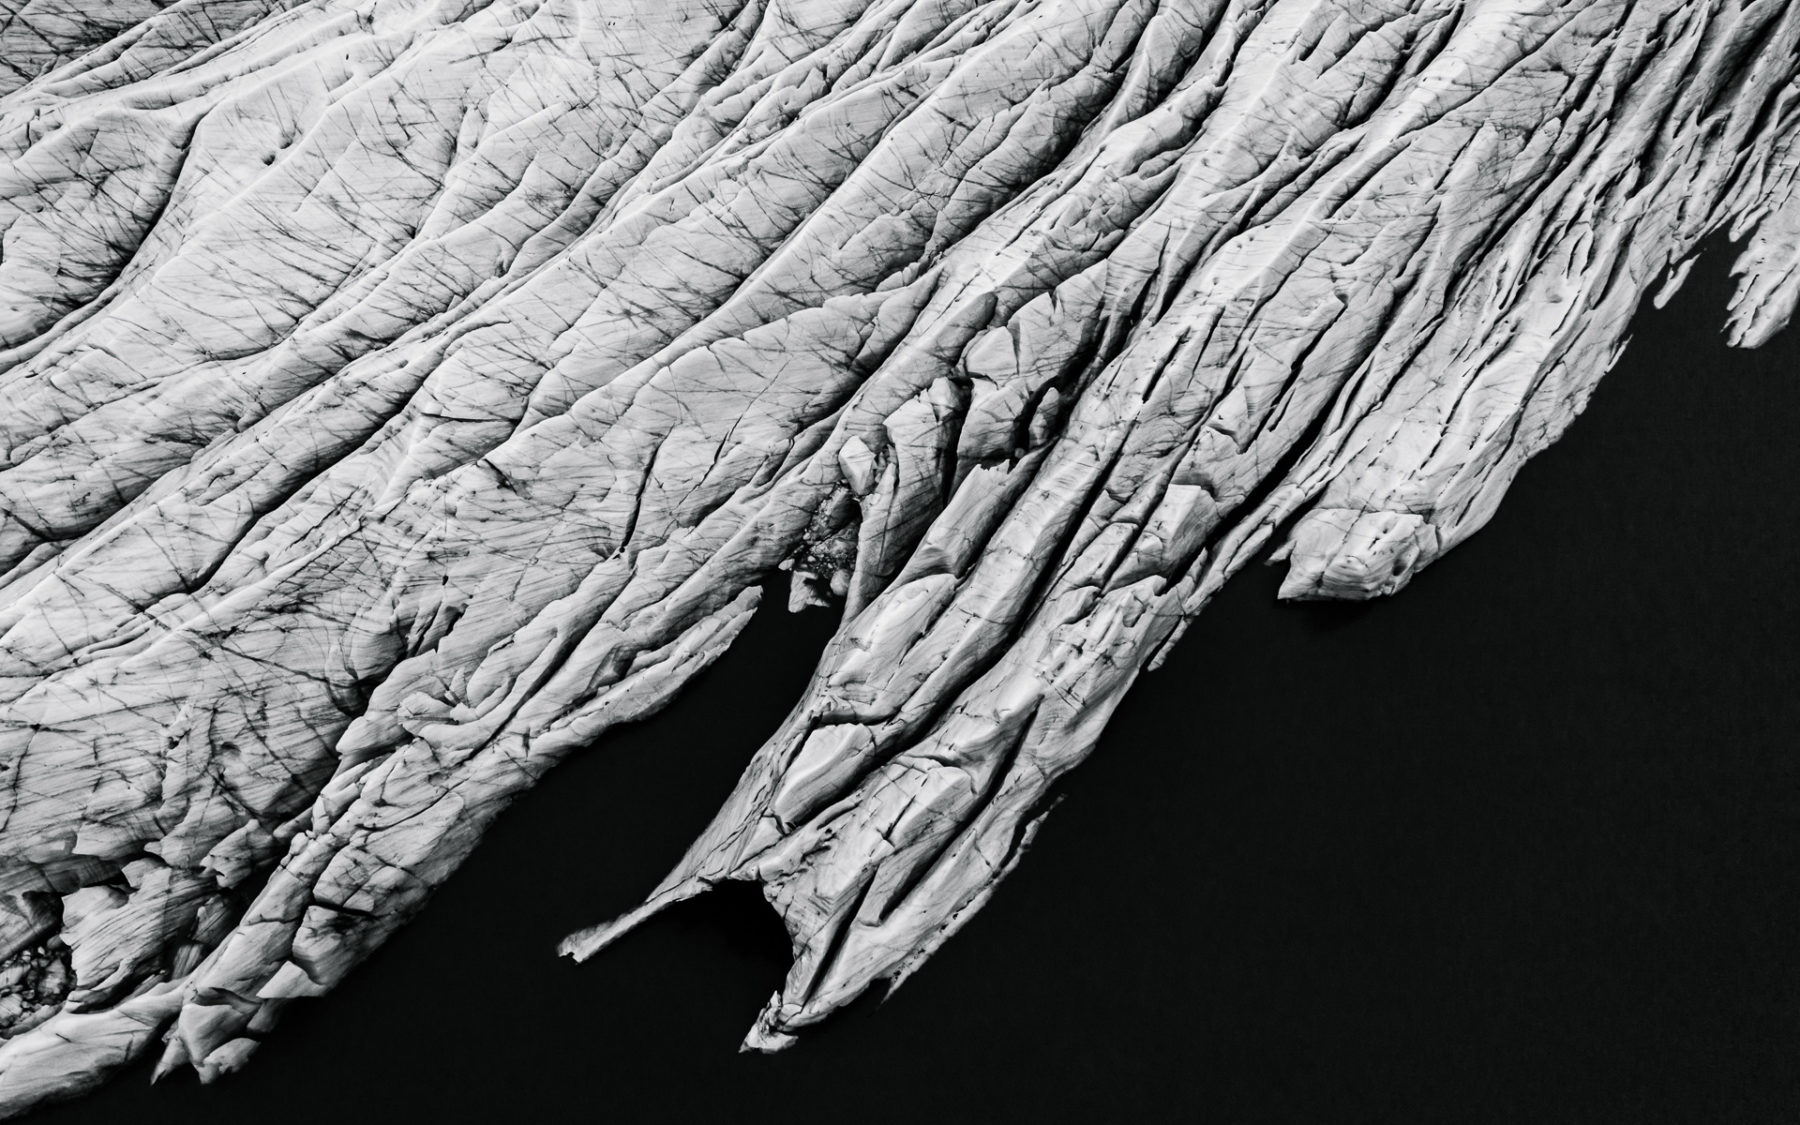 nls 2001 norway iceland portraits of glaciers 12